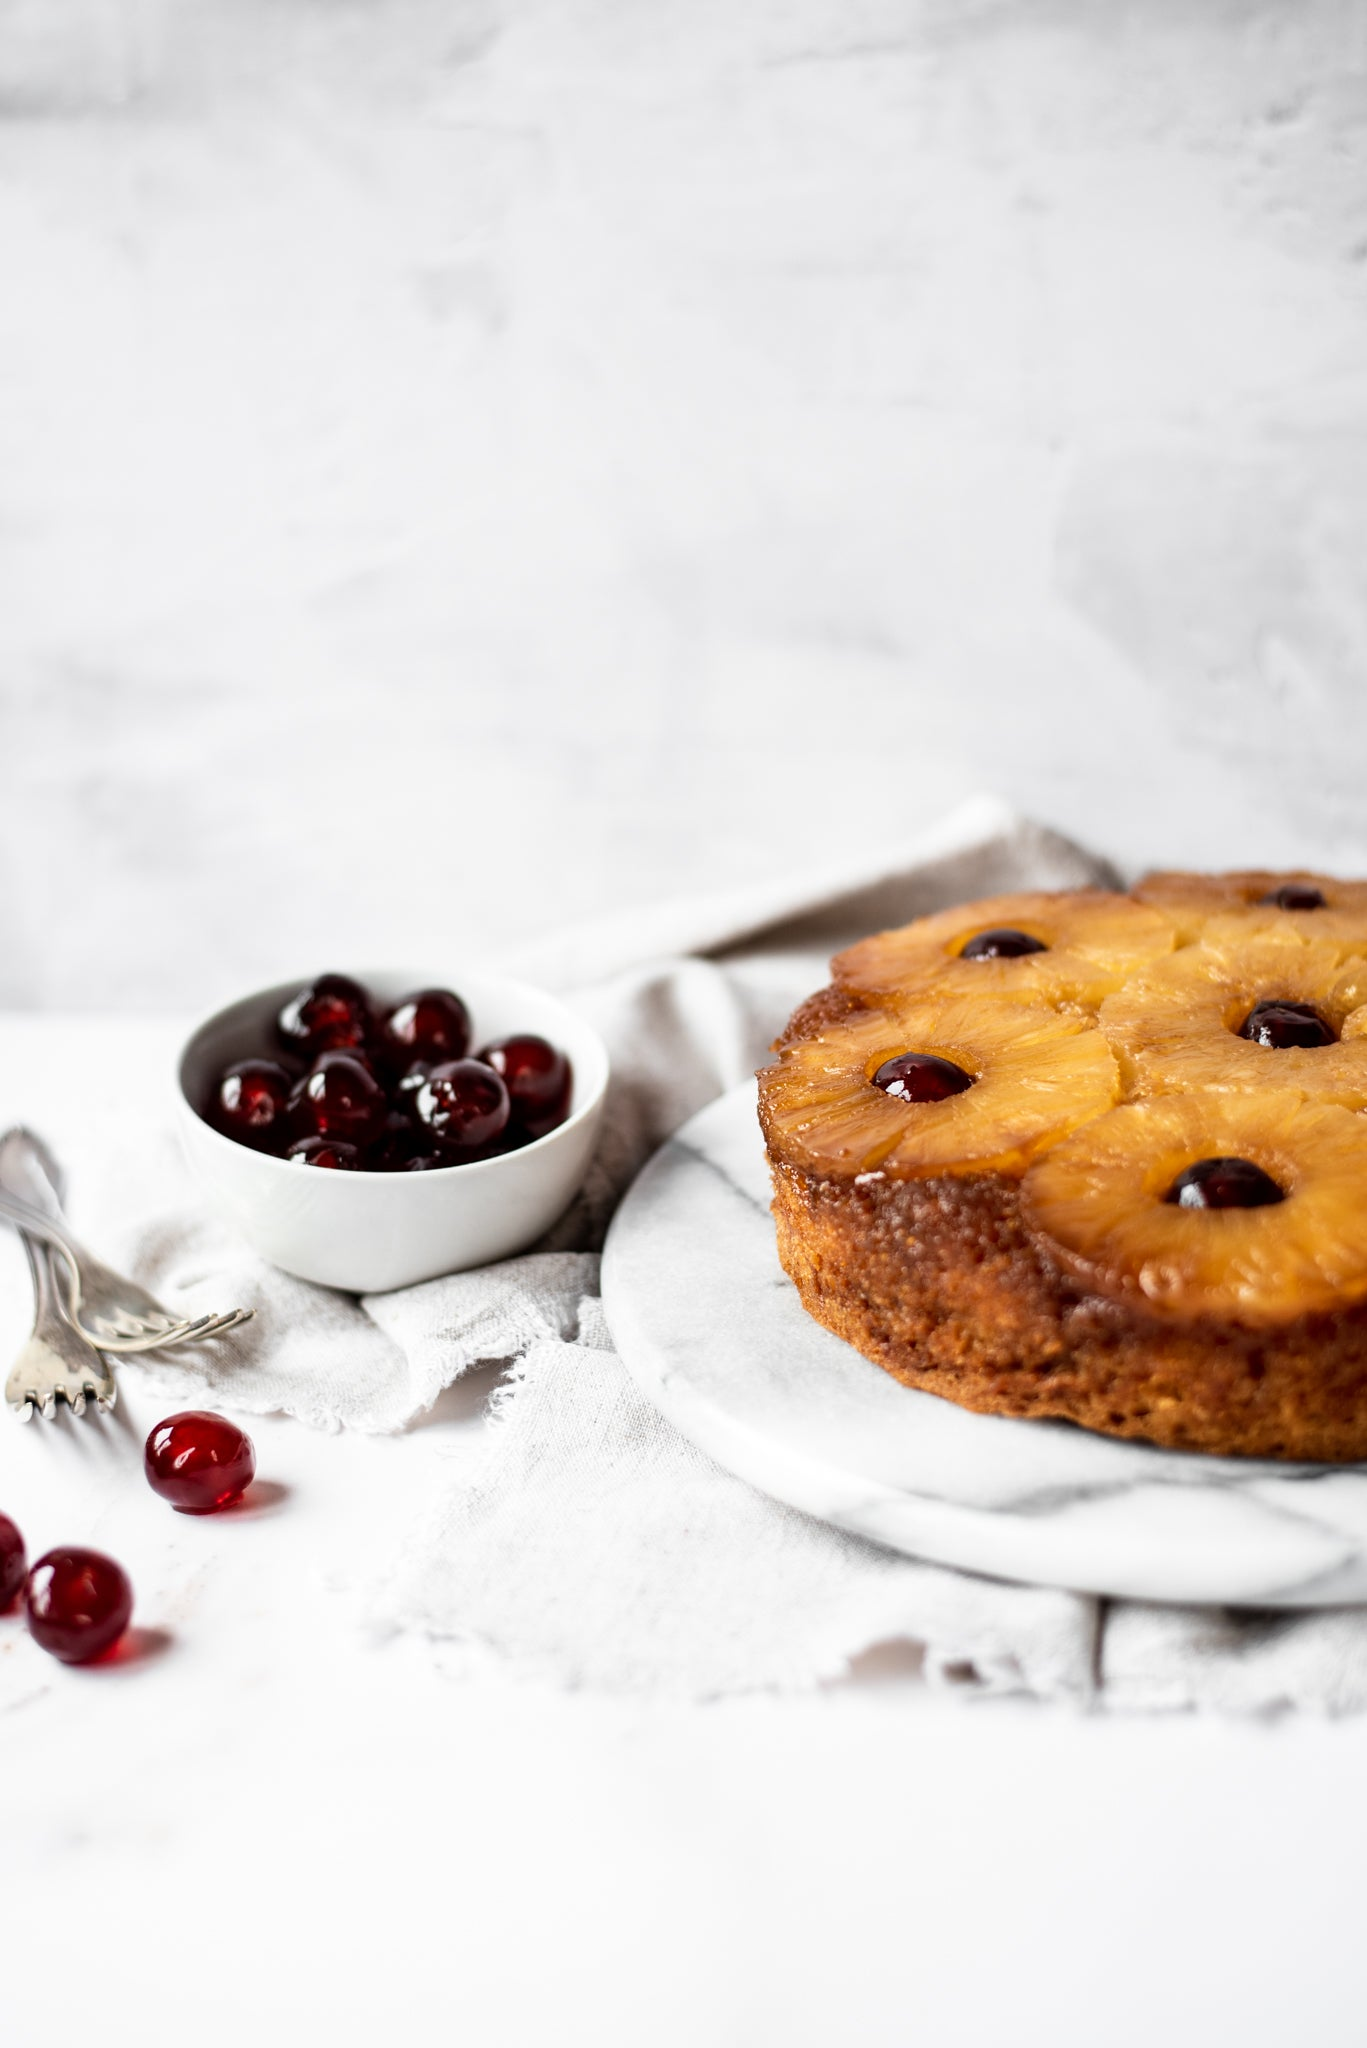 Pineapple-Upside-Down-Cake-WEB-RES-5.jpg